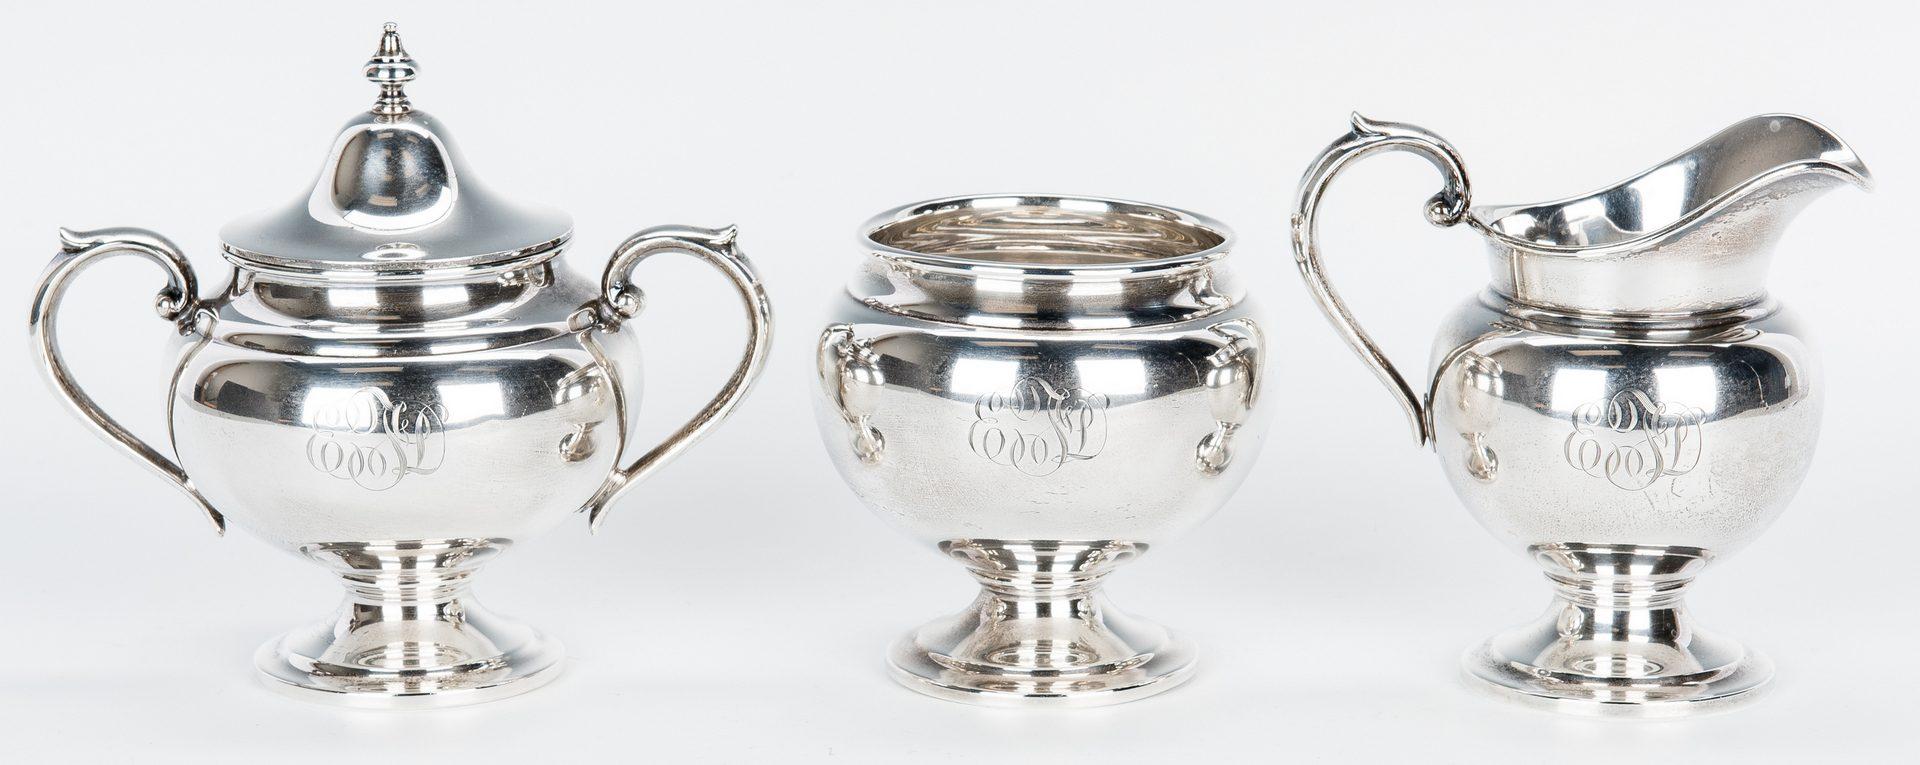 Lot 197: Gorham 5-Pc. Sterling Tea Service, Puritan Pattern